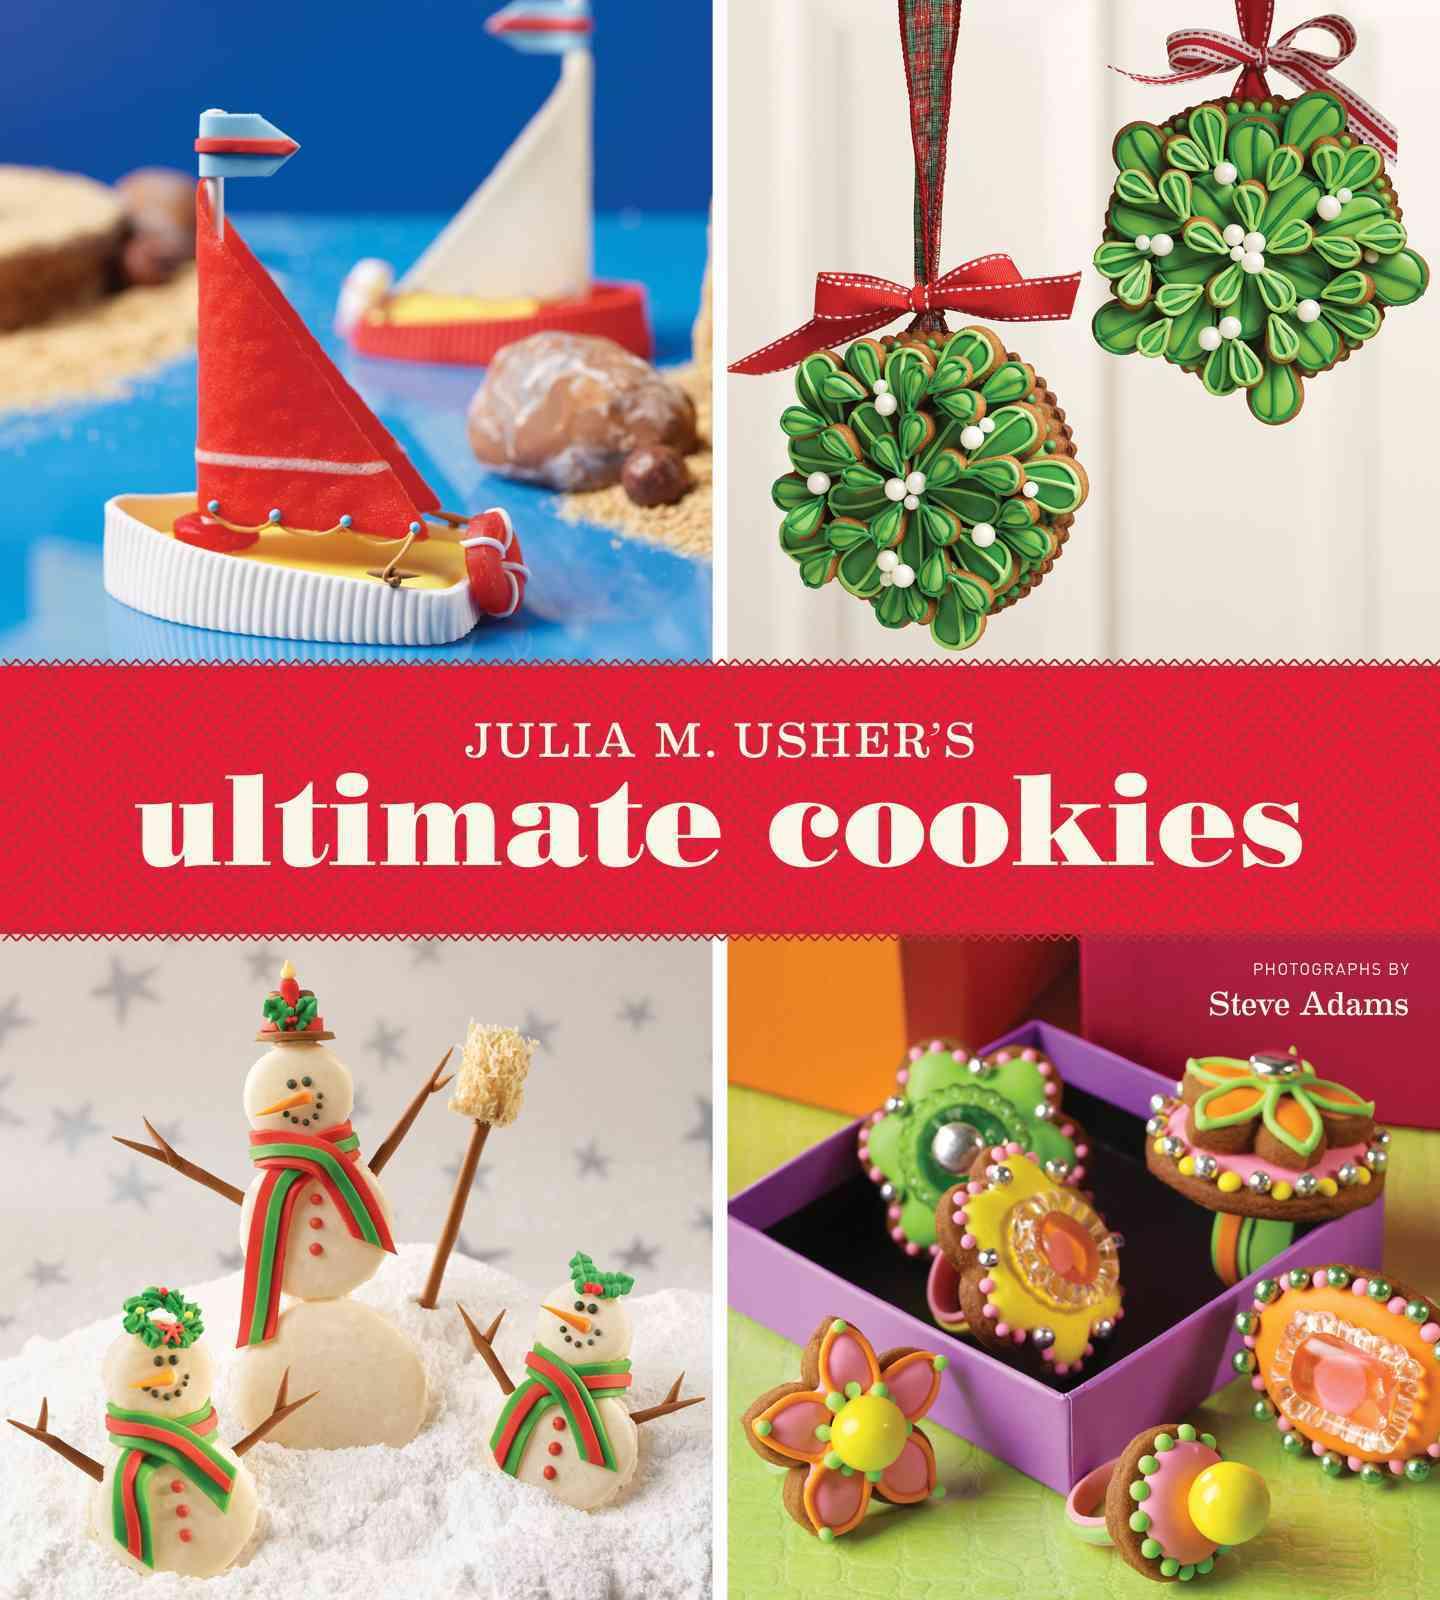 Julia M. Usher's Ultimate Cookies (Paperback)